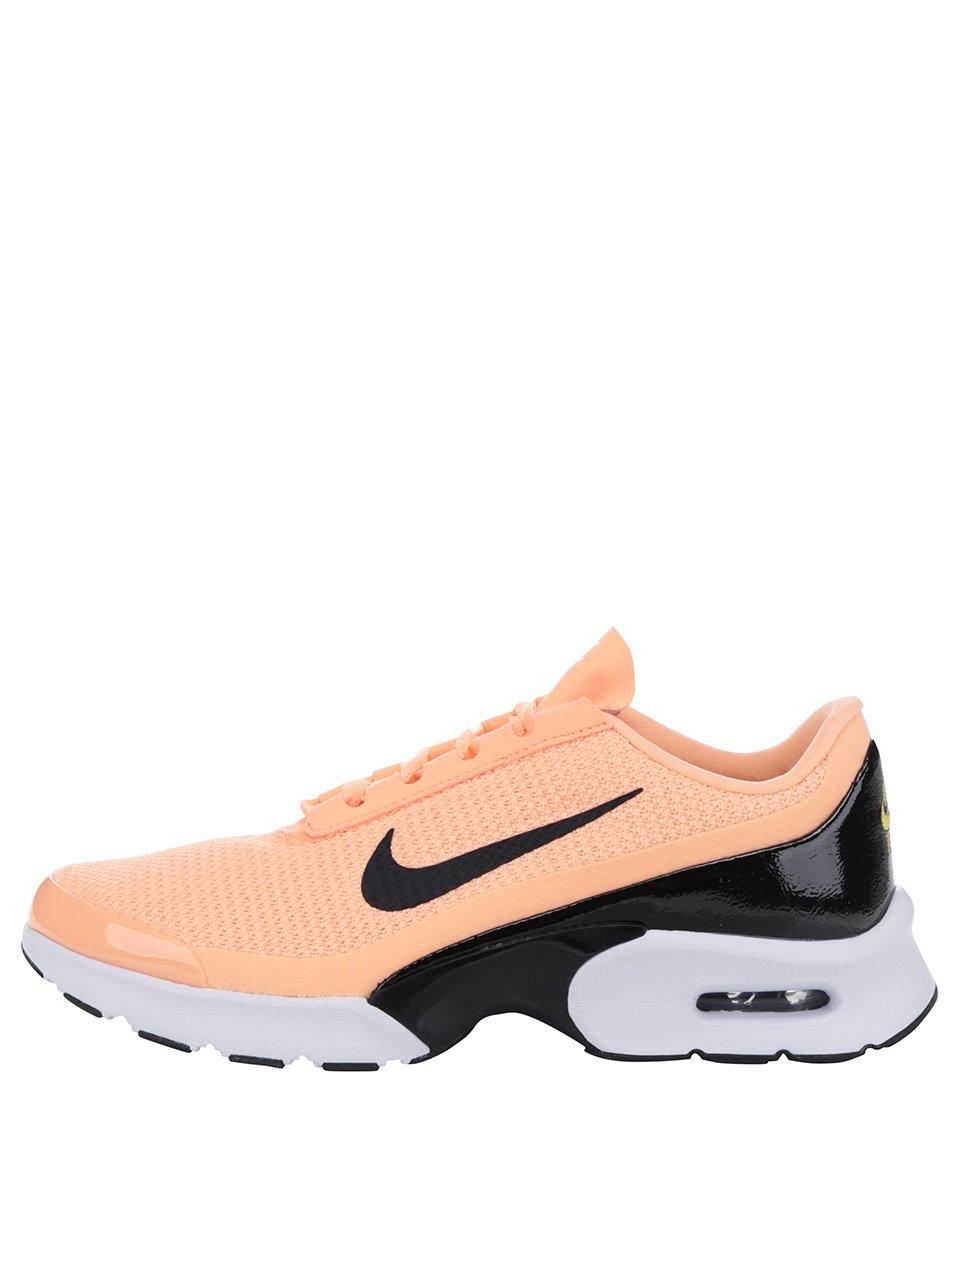 Oranžové dámské tenisky Nike Air Max Jewell